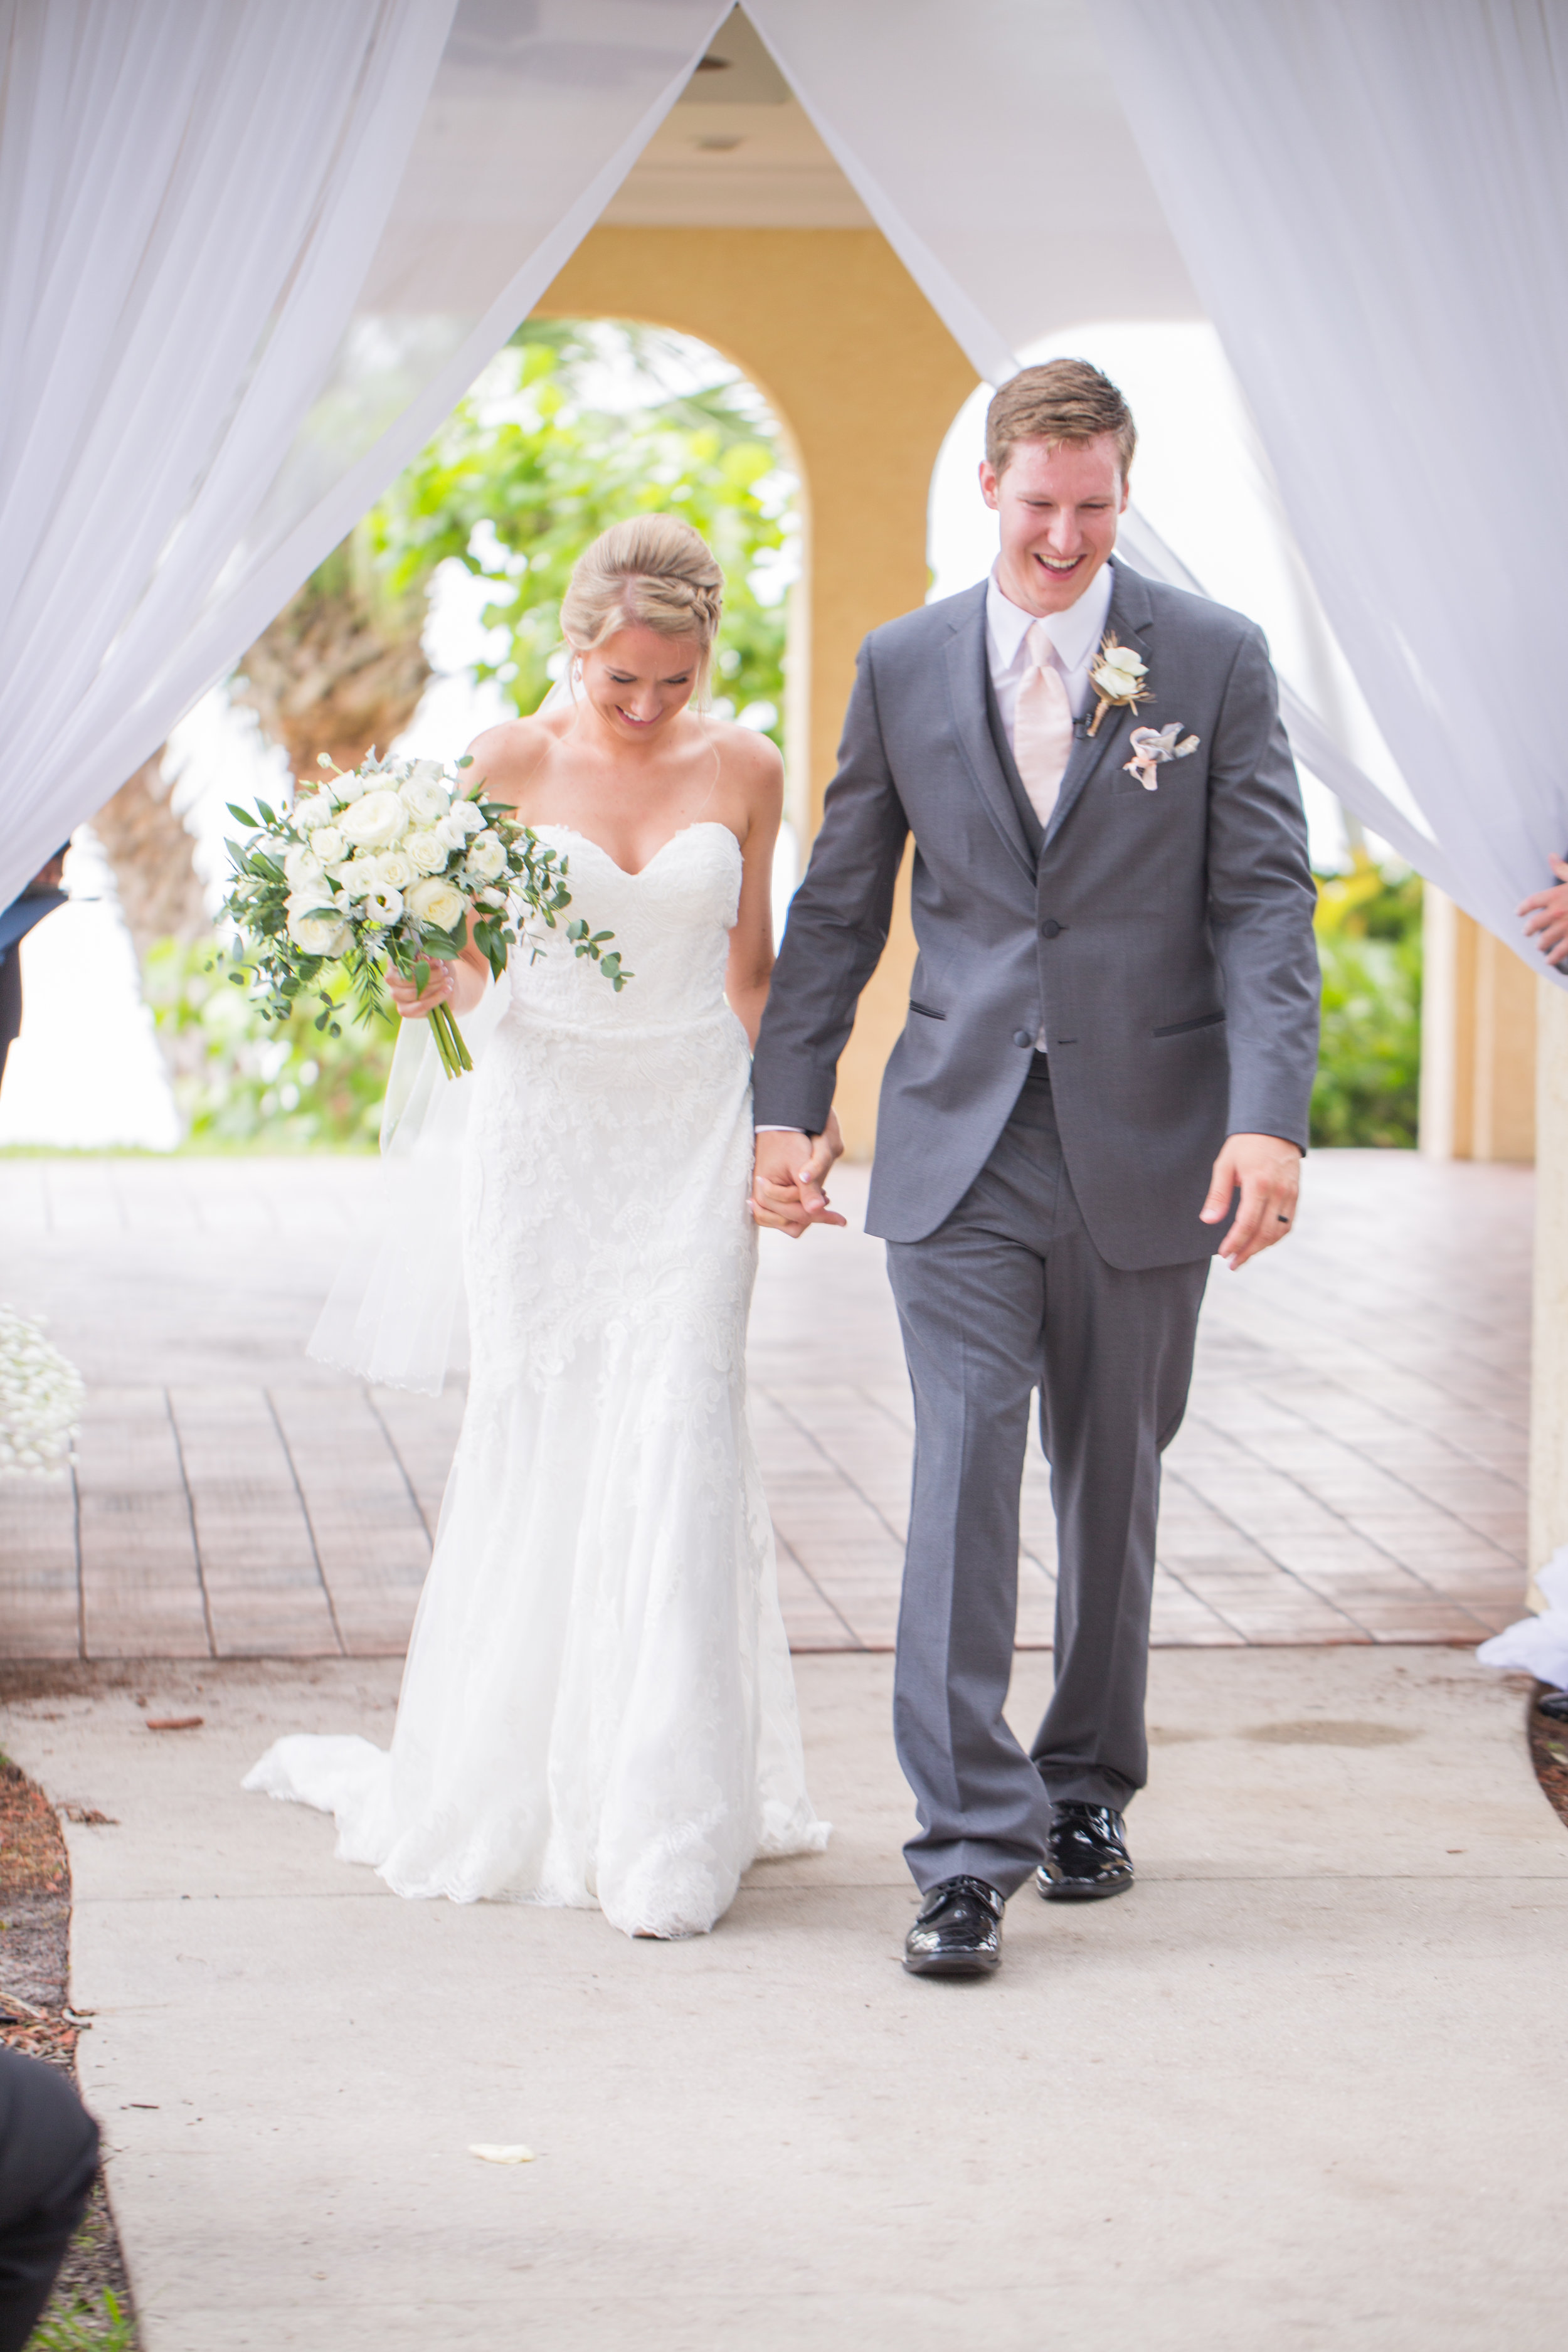 Powel Crosley Estate   Wedding   Pink and Gold Wedding   Wedding Portraits  Sarasota Weddings   Spring Wedding   Jess Anne Photography